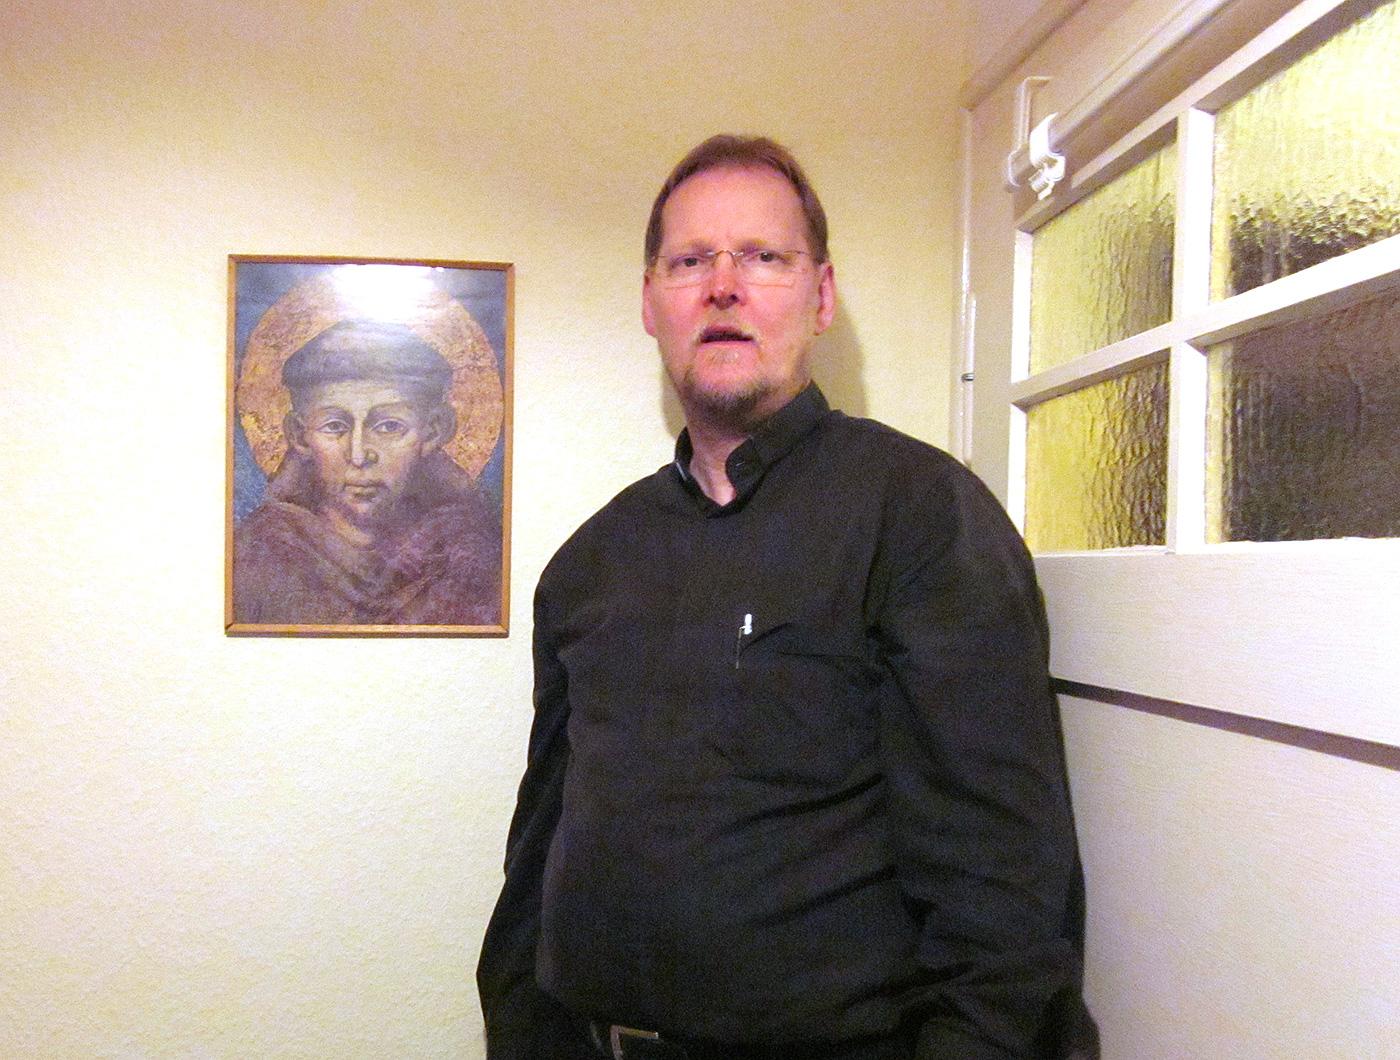 Priester Burkhard Stegemann aus Bad Belzig